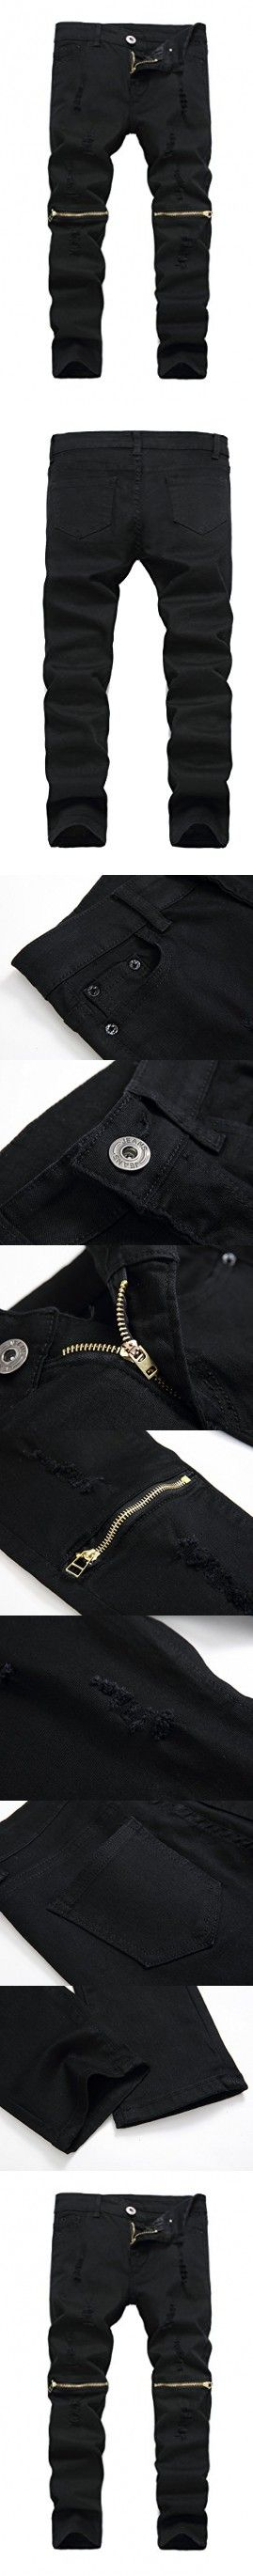 14222b97c Boy's Black Slim Fit Skinny Jeans Ripped Elastic Waist Pants with Zipper  for Kids